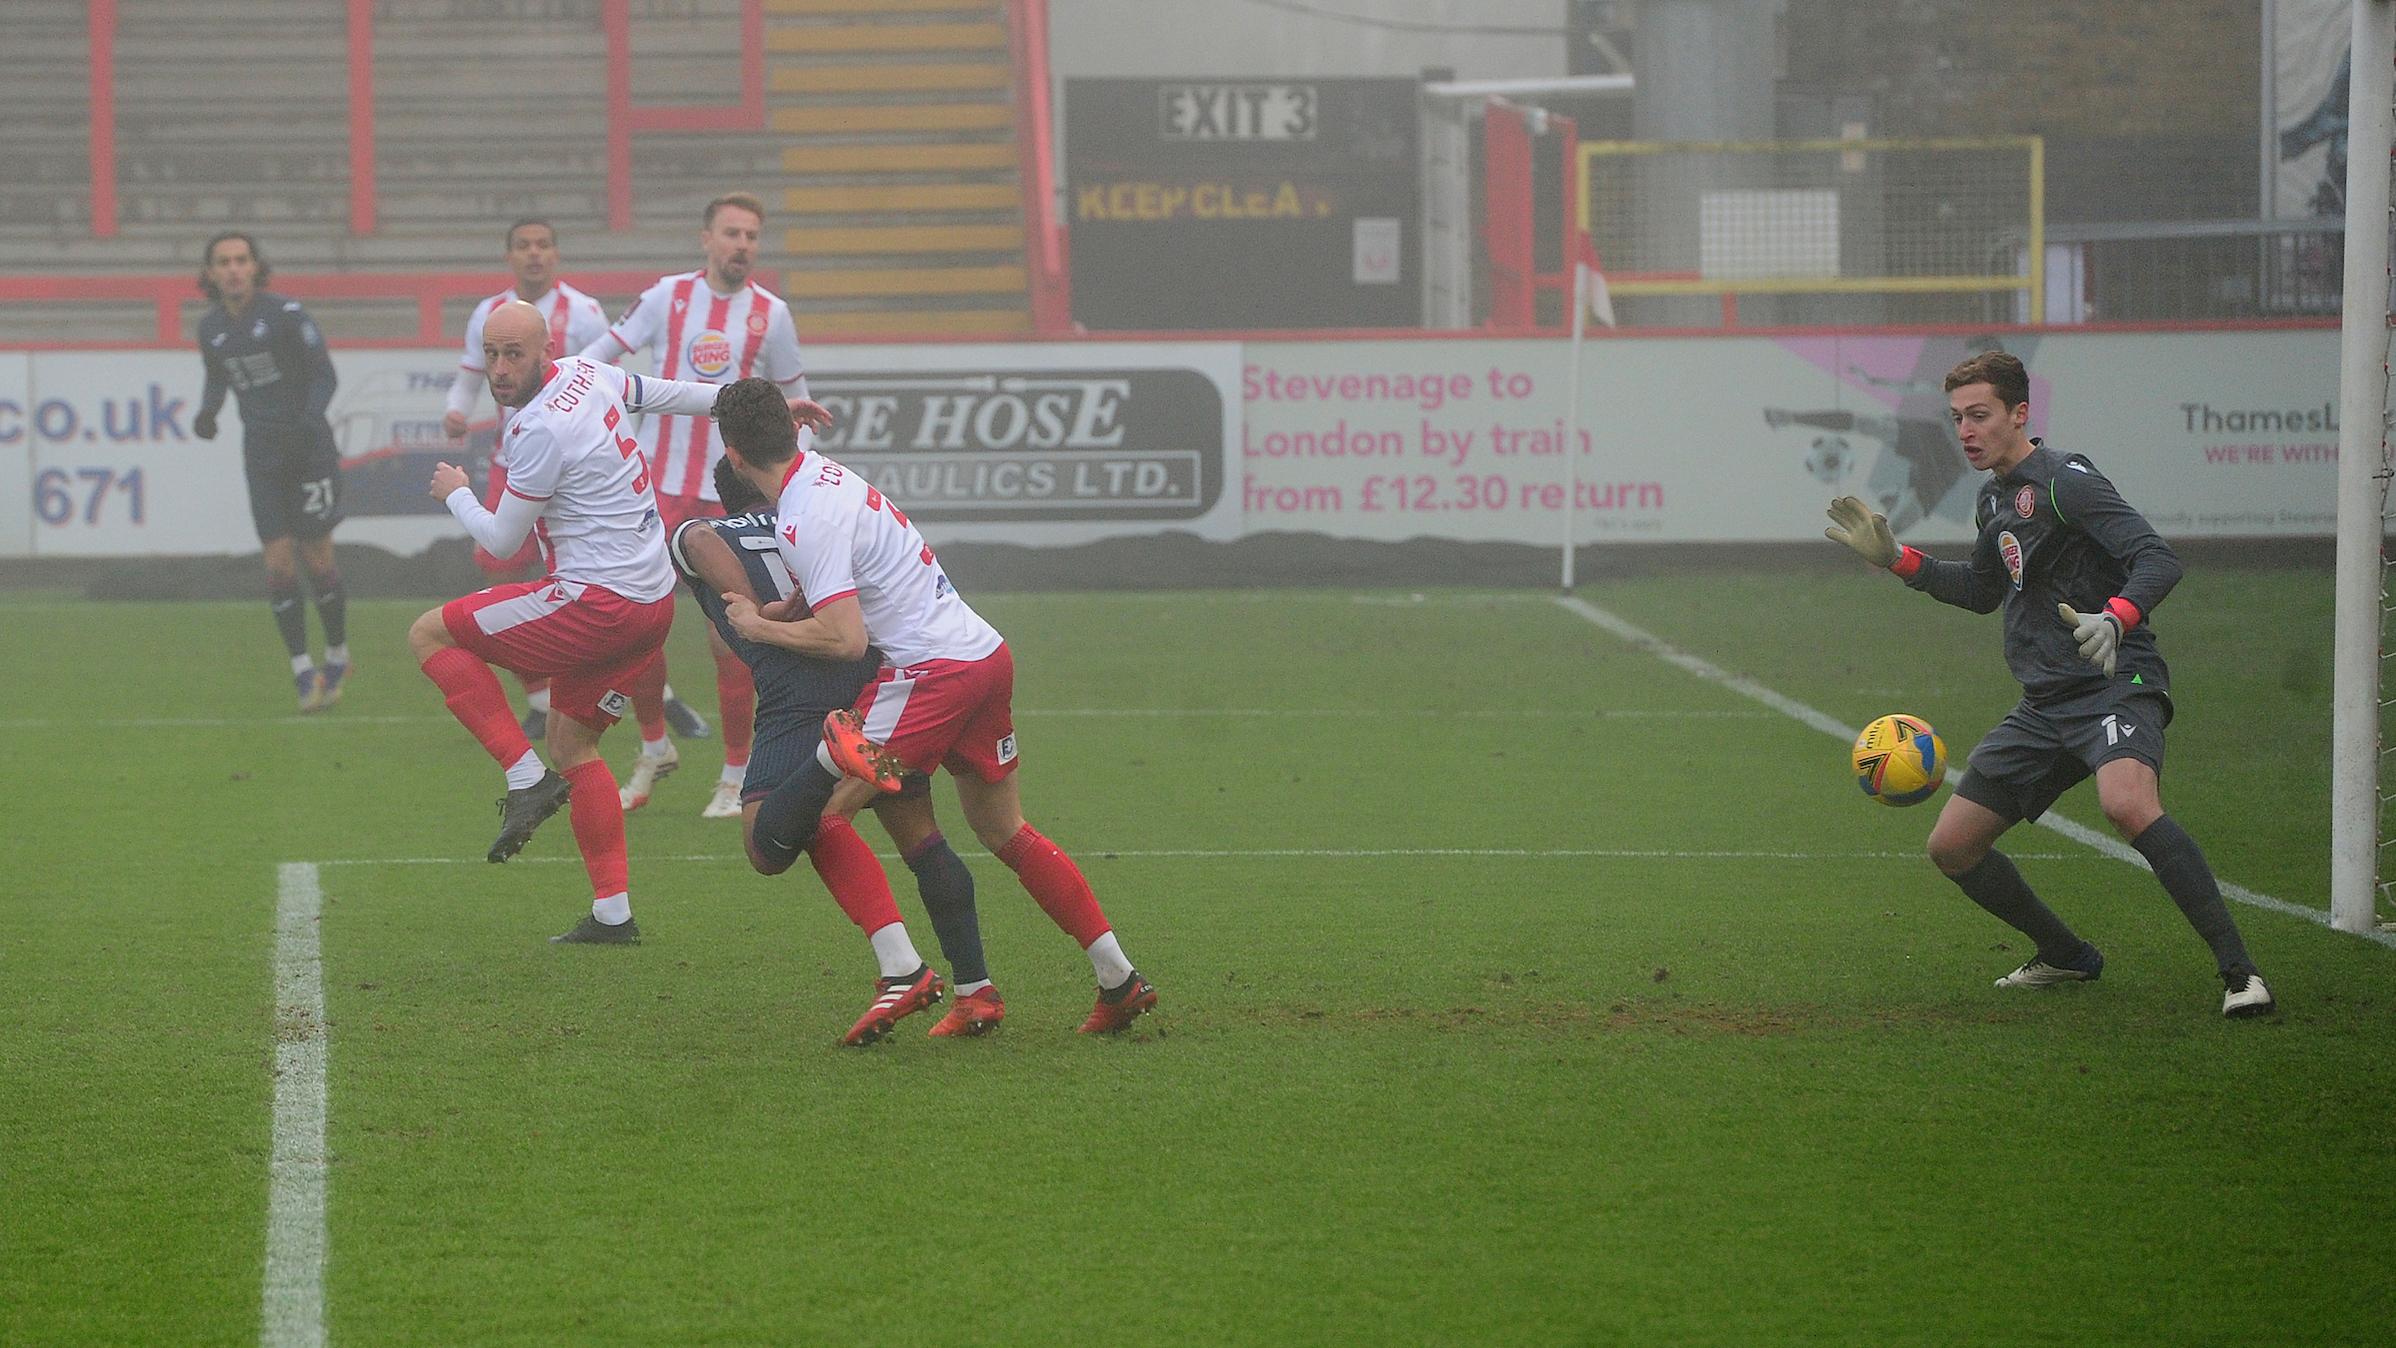 Wayne Routledge goal Stevenage